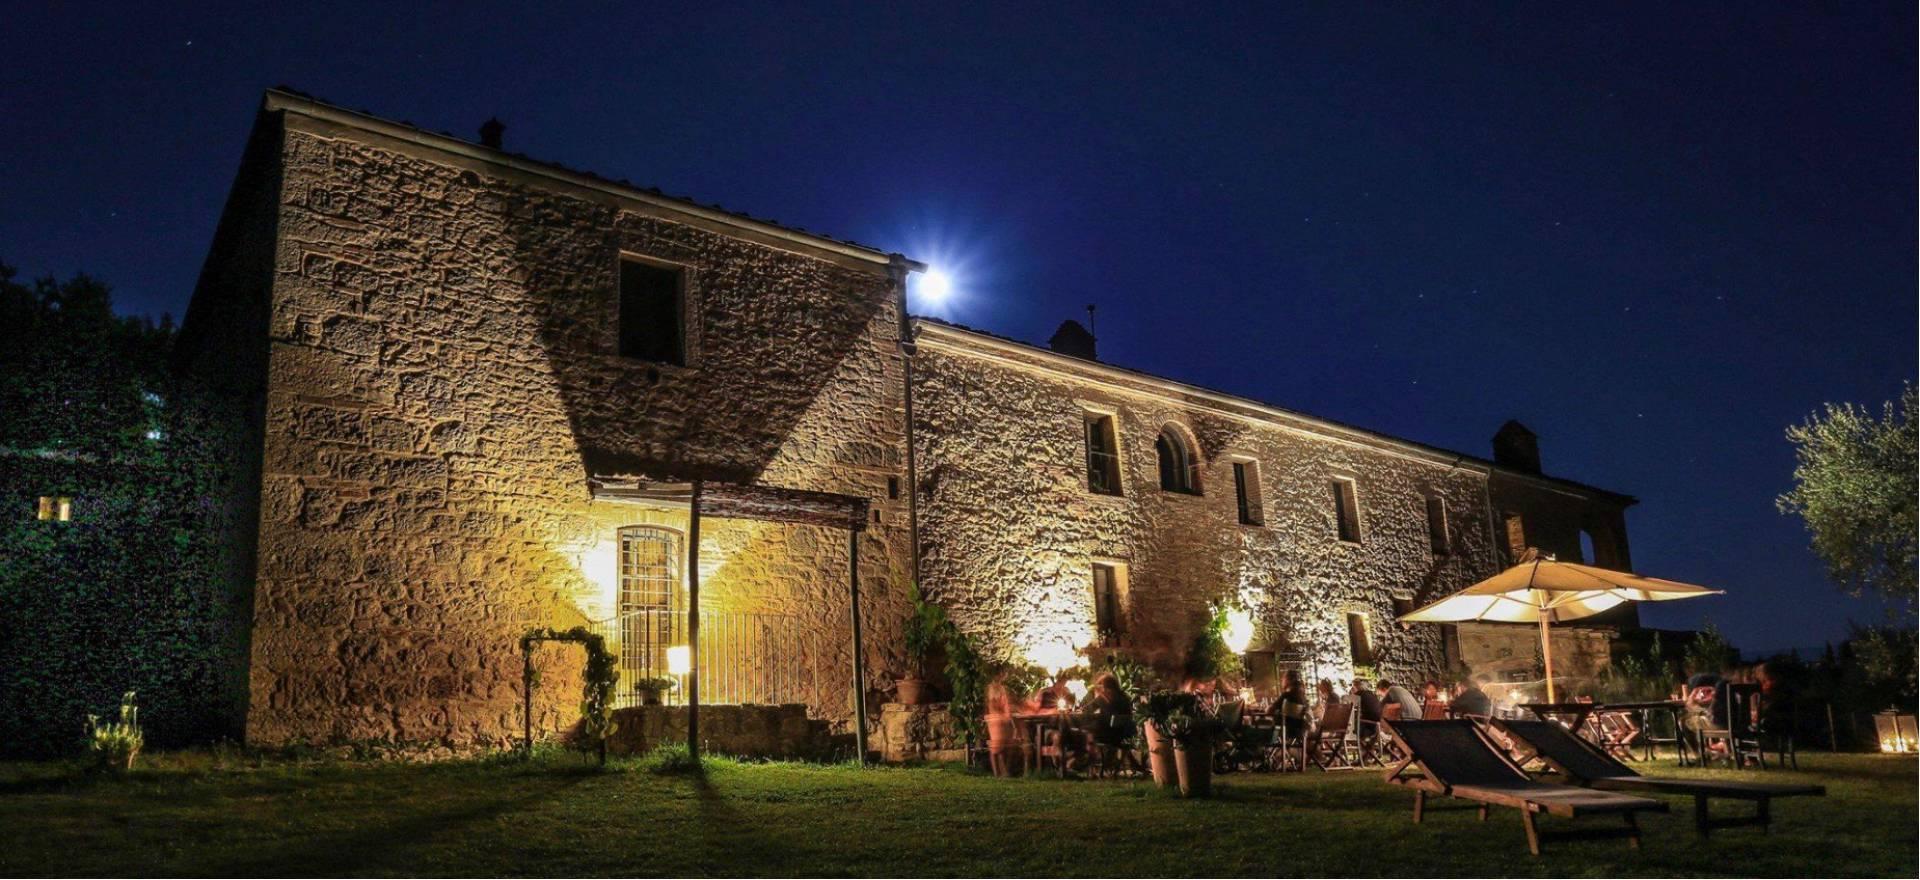 Agriturismo Toscane Prachtige agriturismo nabij Pienza met restaurant